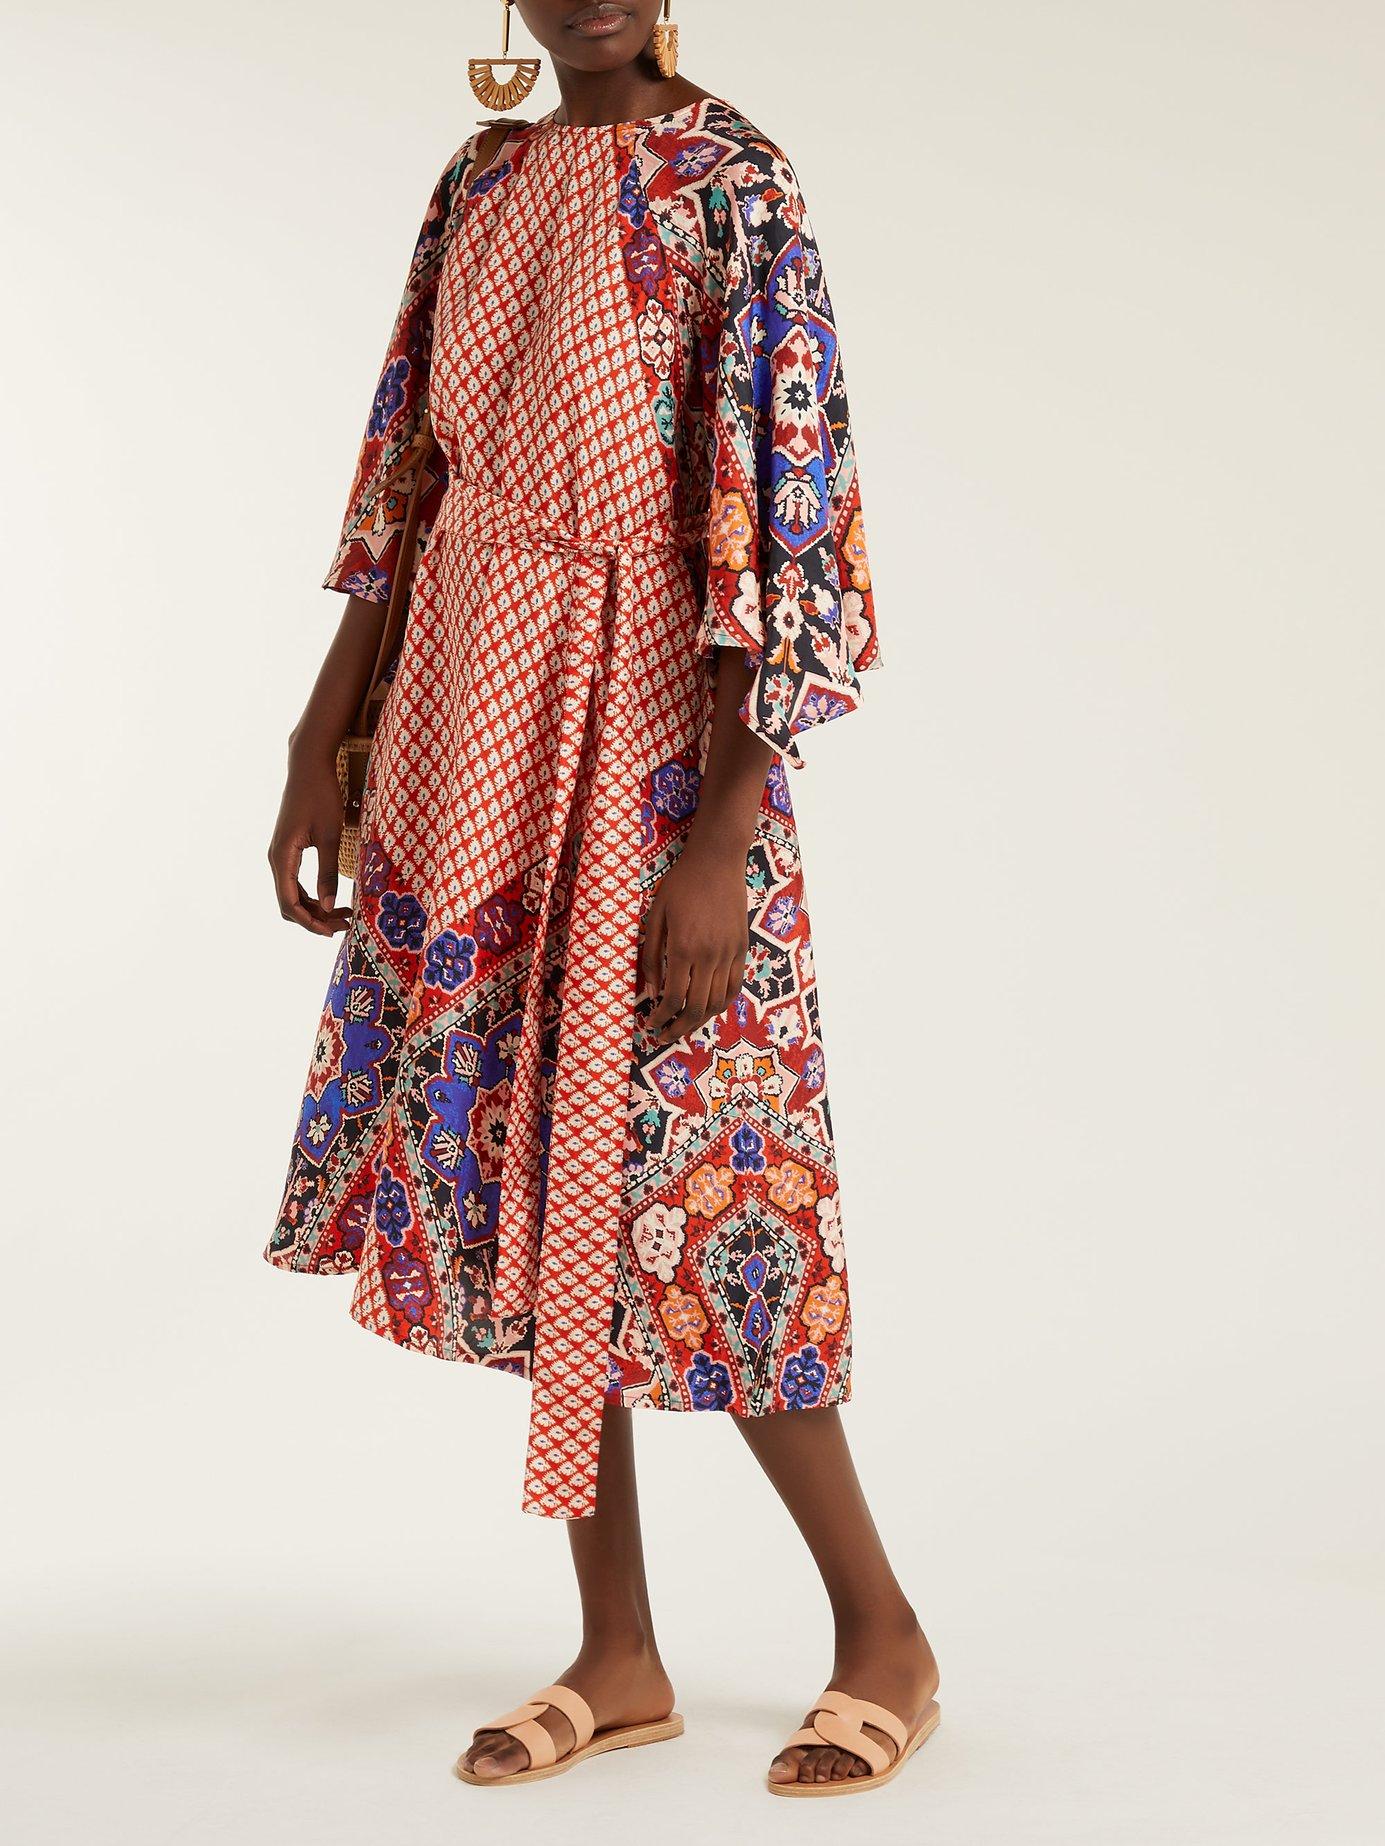 Alessandra tile-print silk dress by D'Ascoli